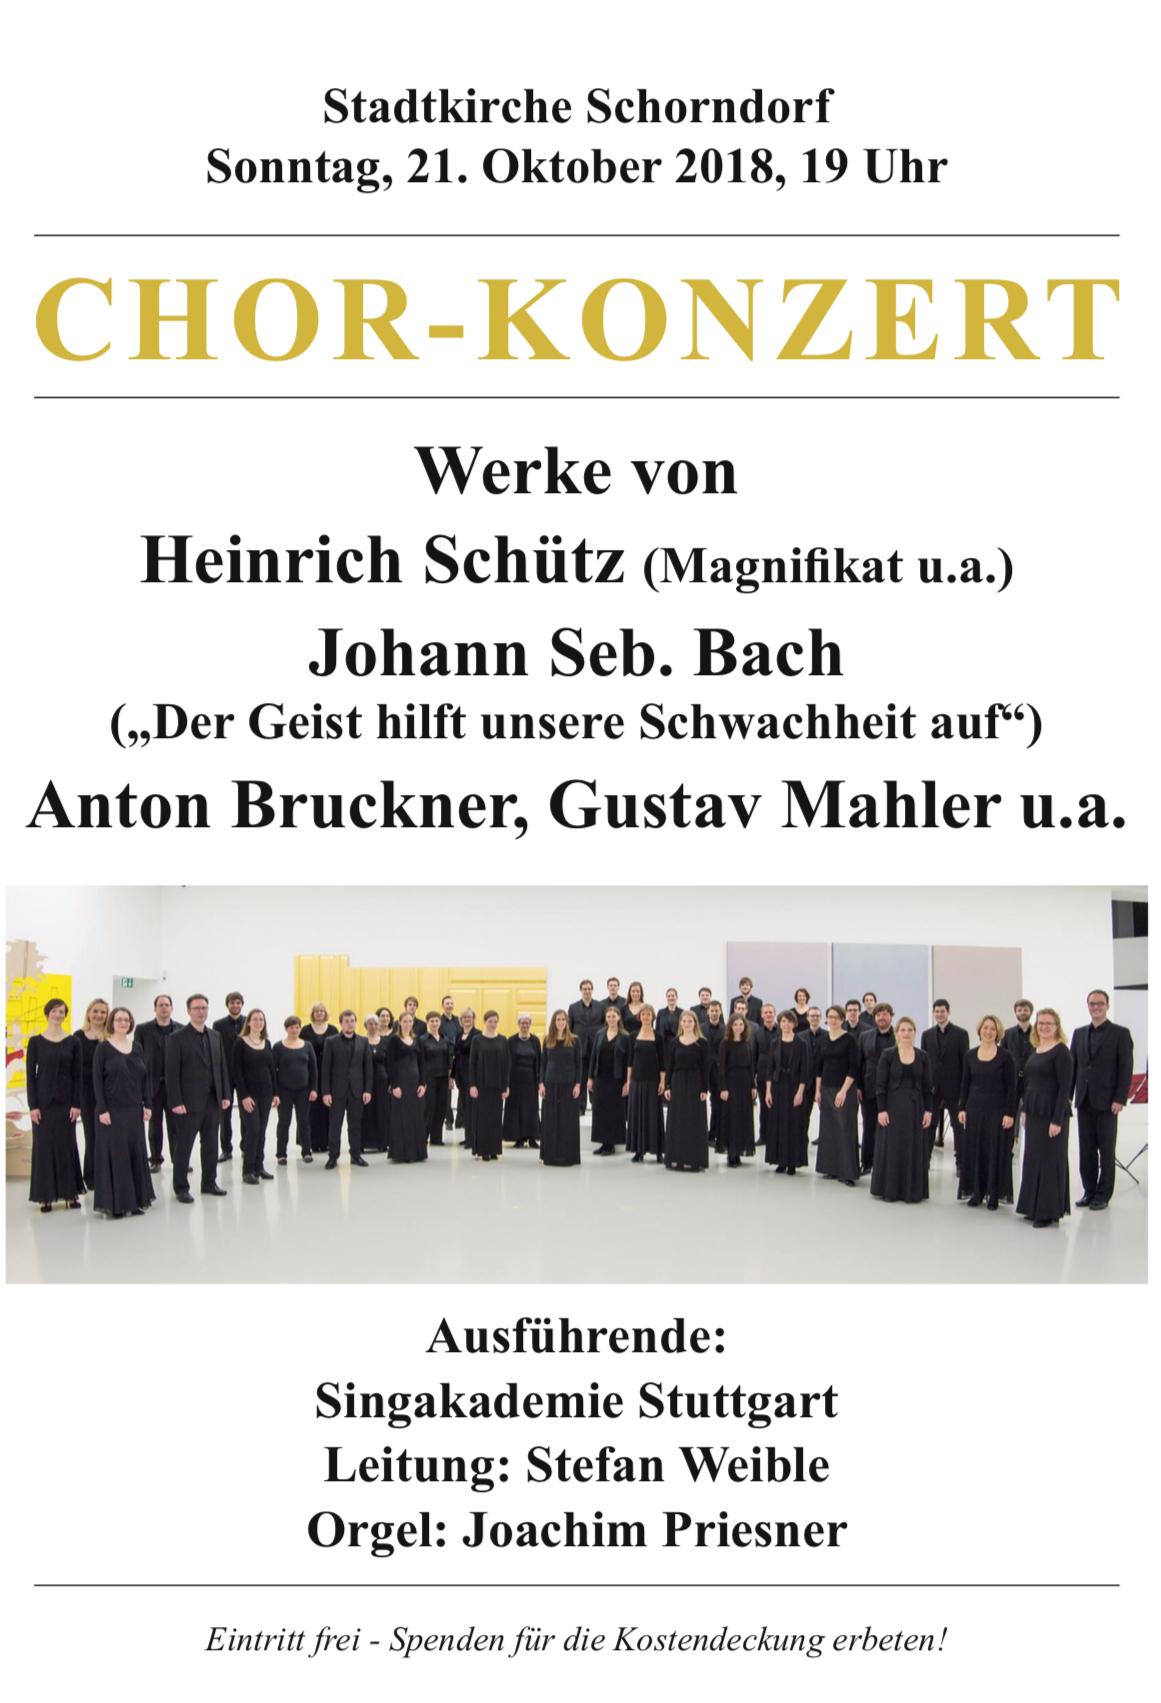 Plakat Stadtkirche Schorndorf